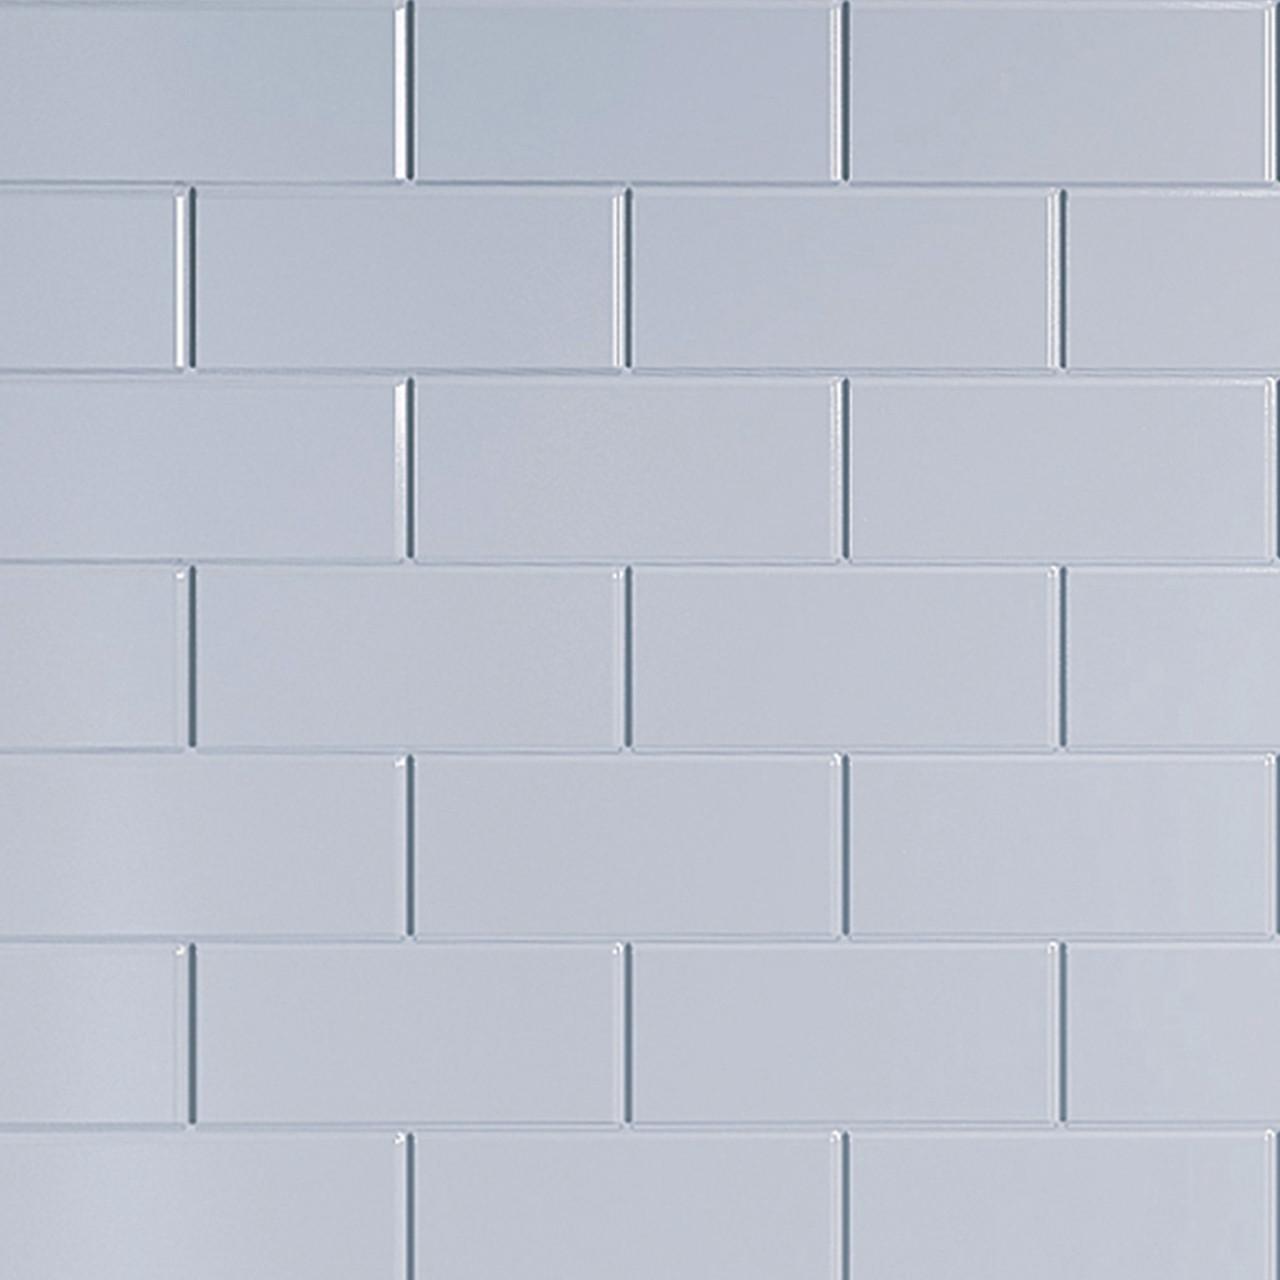 multipanel_white_vertical_brick_tile_2440mm_1220mm_bathroom_wall_panel_3.jpg